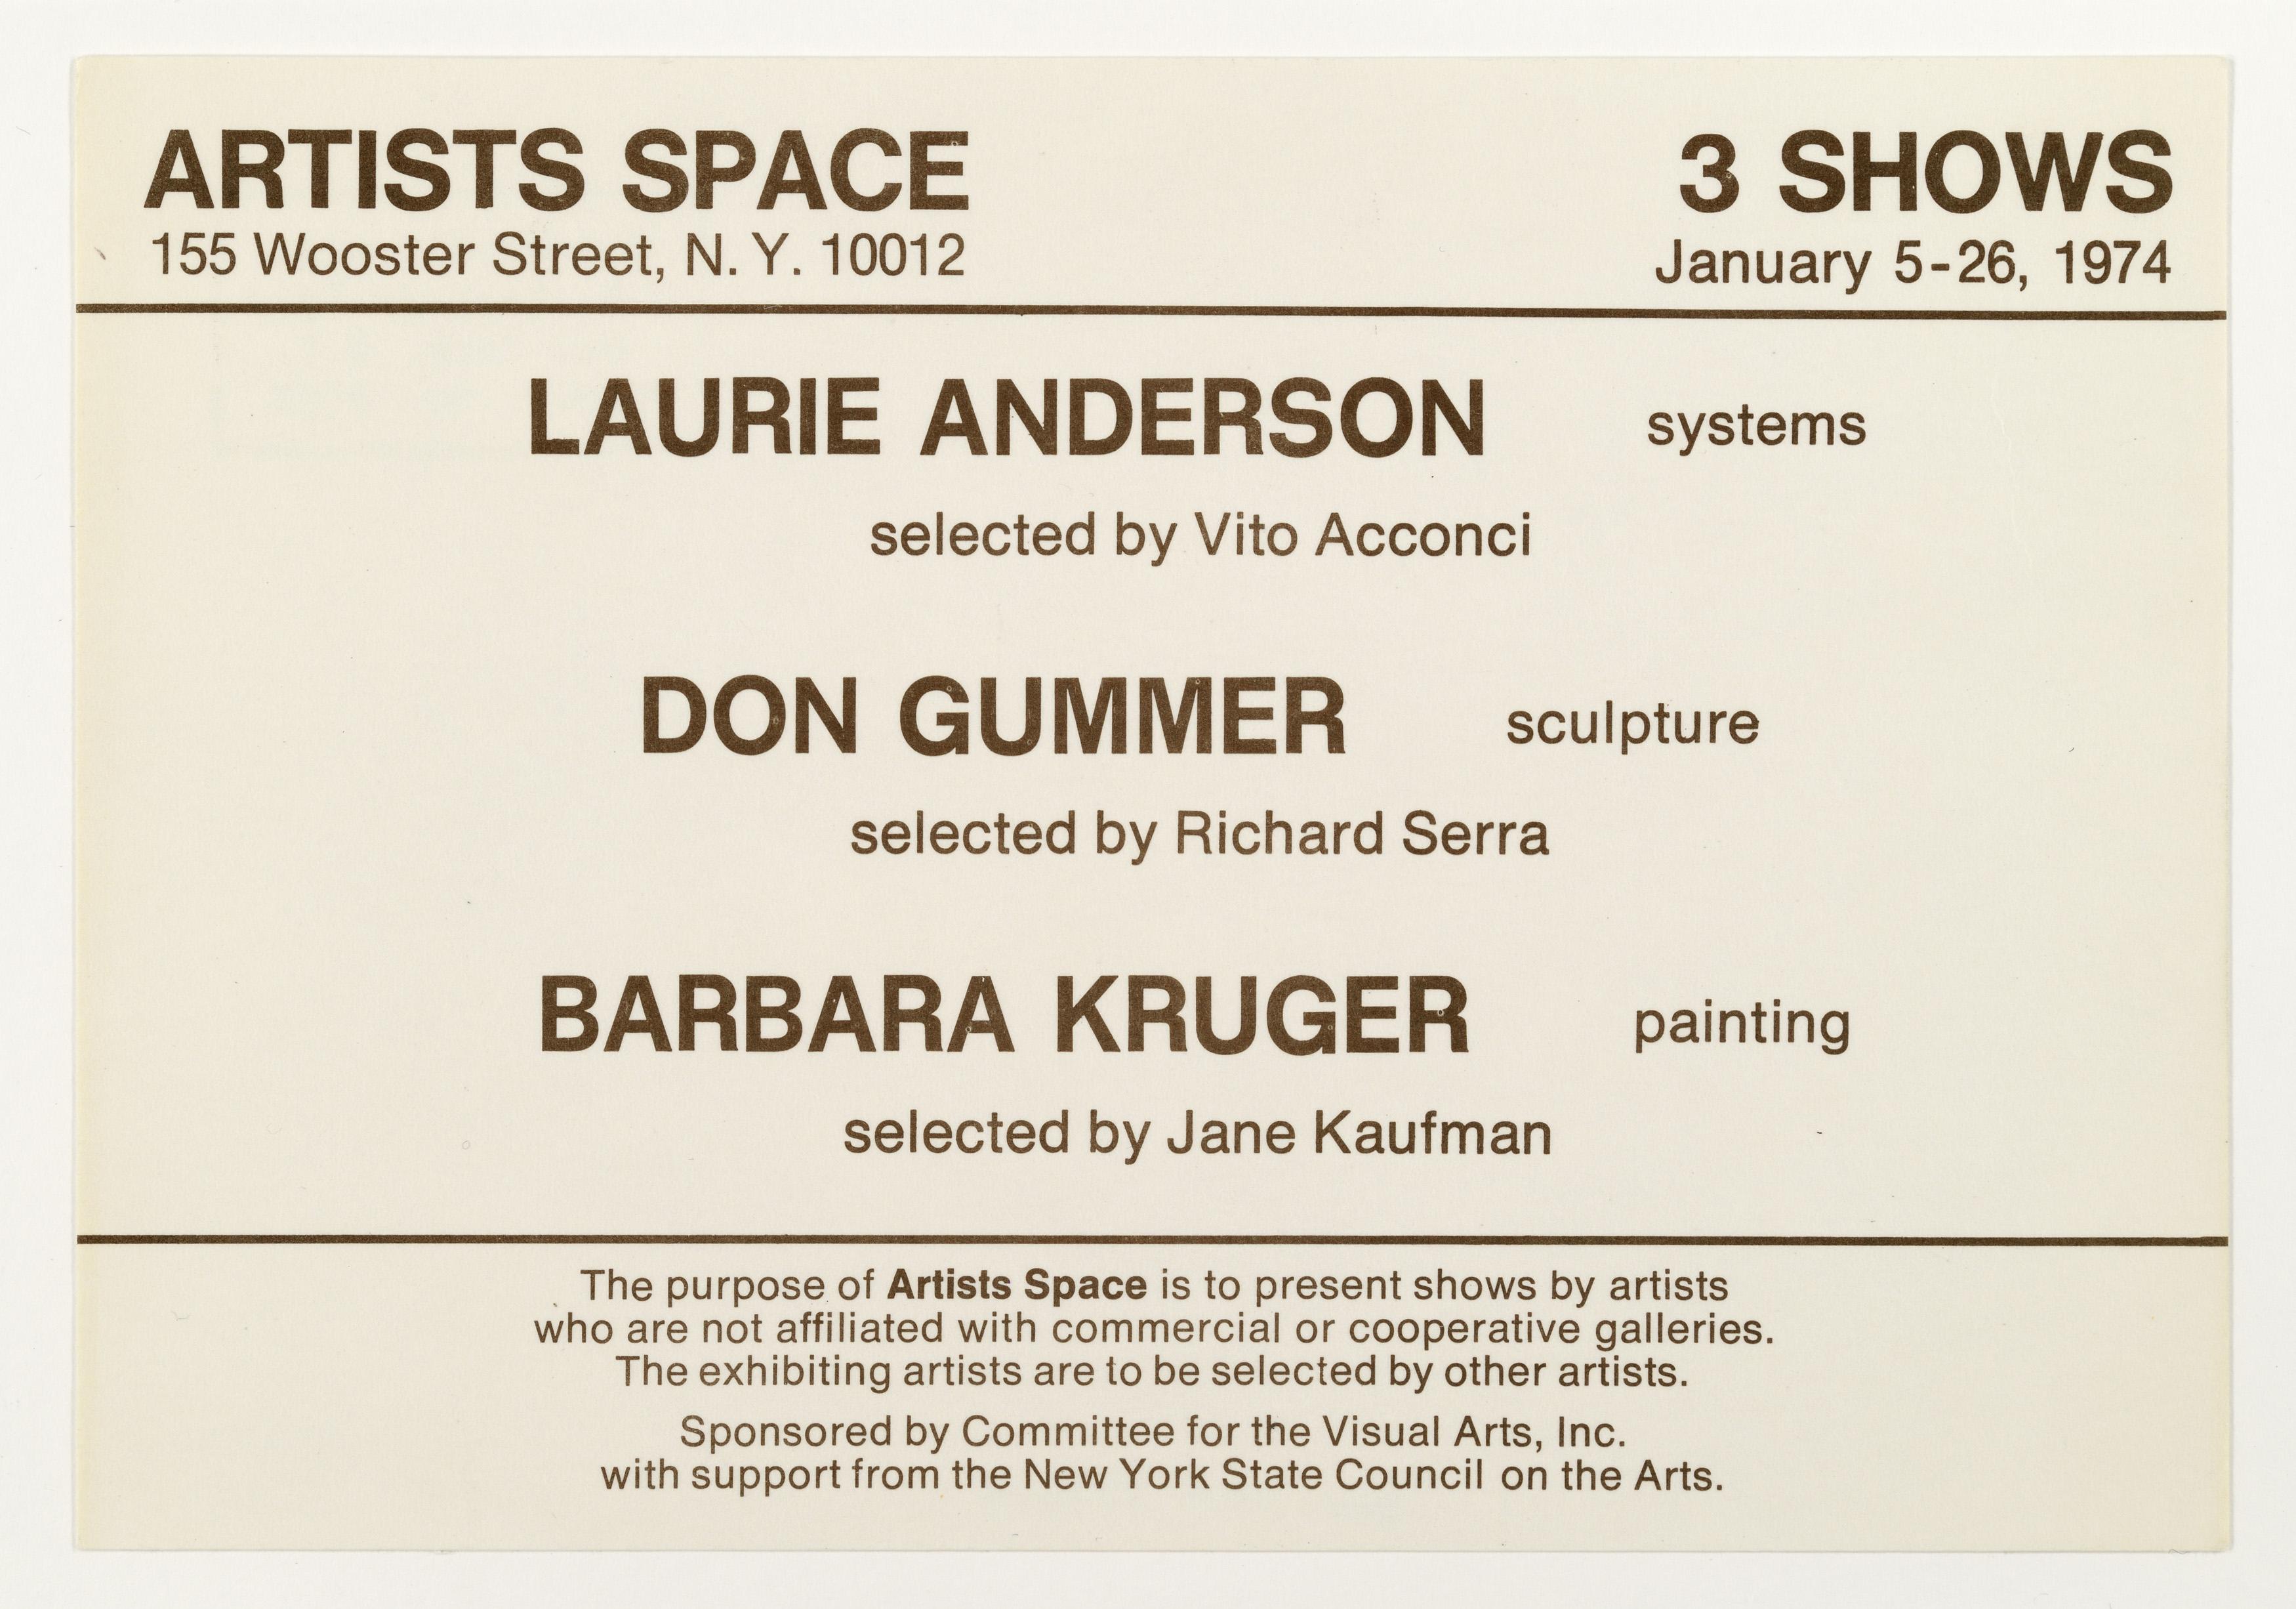 ARTISTS SPACE, NYC,: Laurie Anderson, Don Gummer, Barbara Kruger, 1974 (Invitation); Sammlung Marzona, Kunstbibliothek – Staatliche Museen zu Berlin